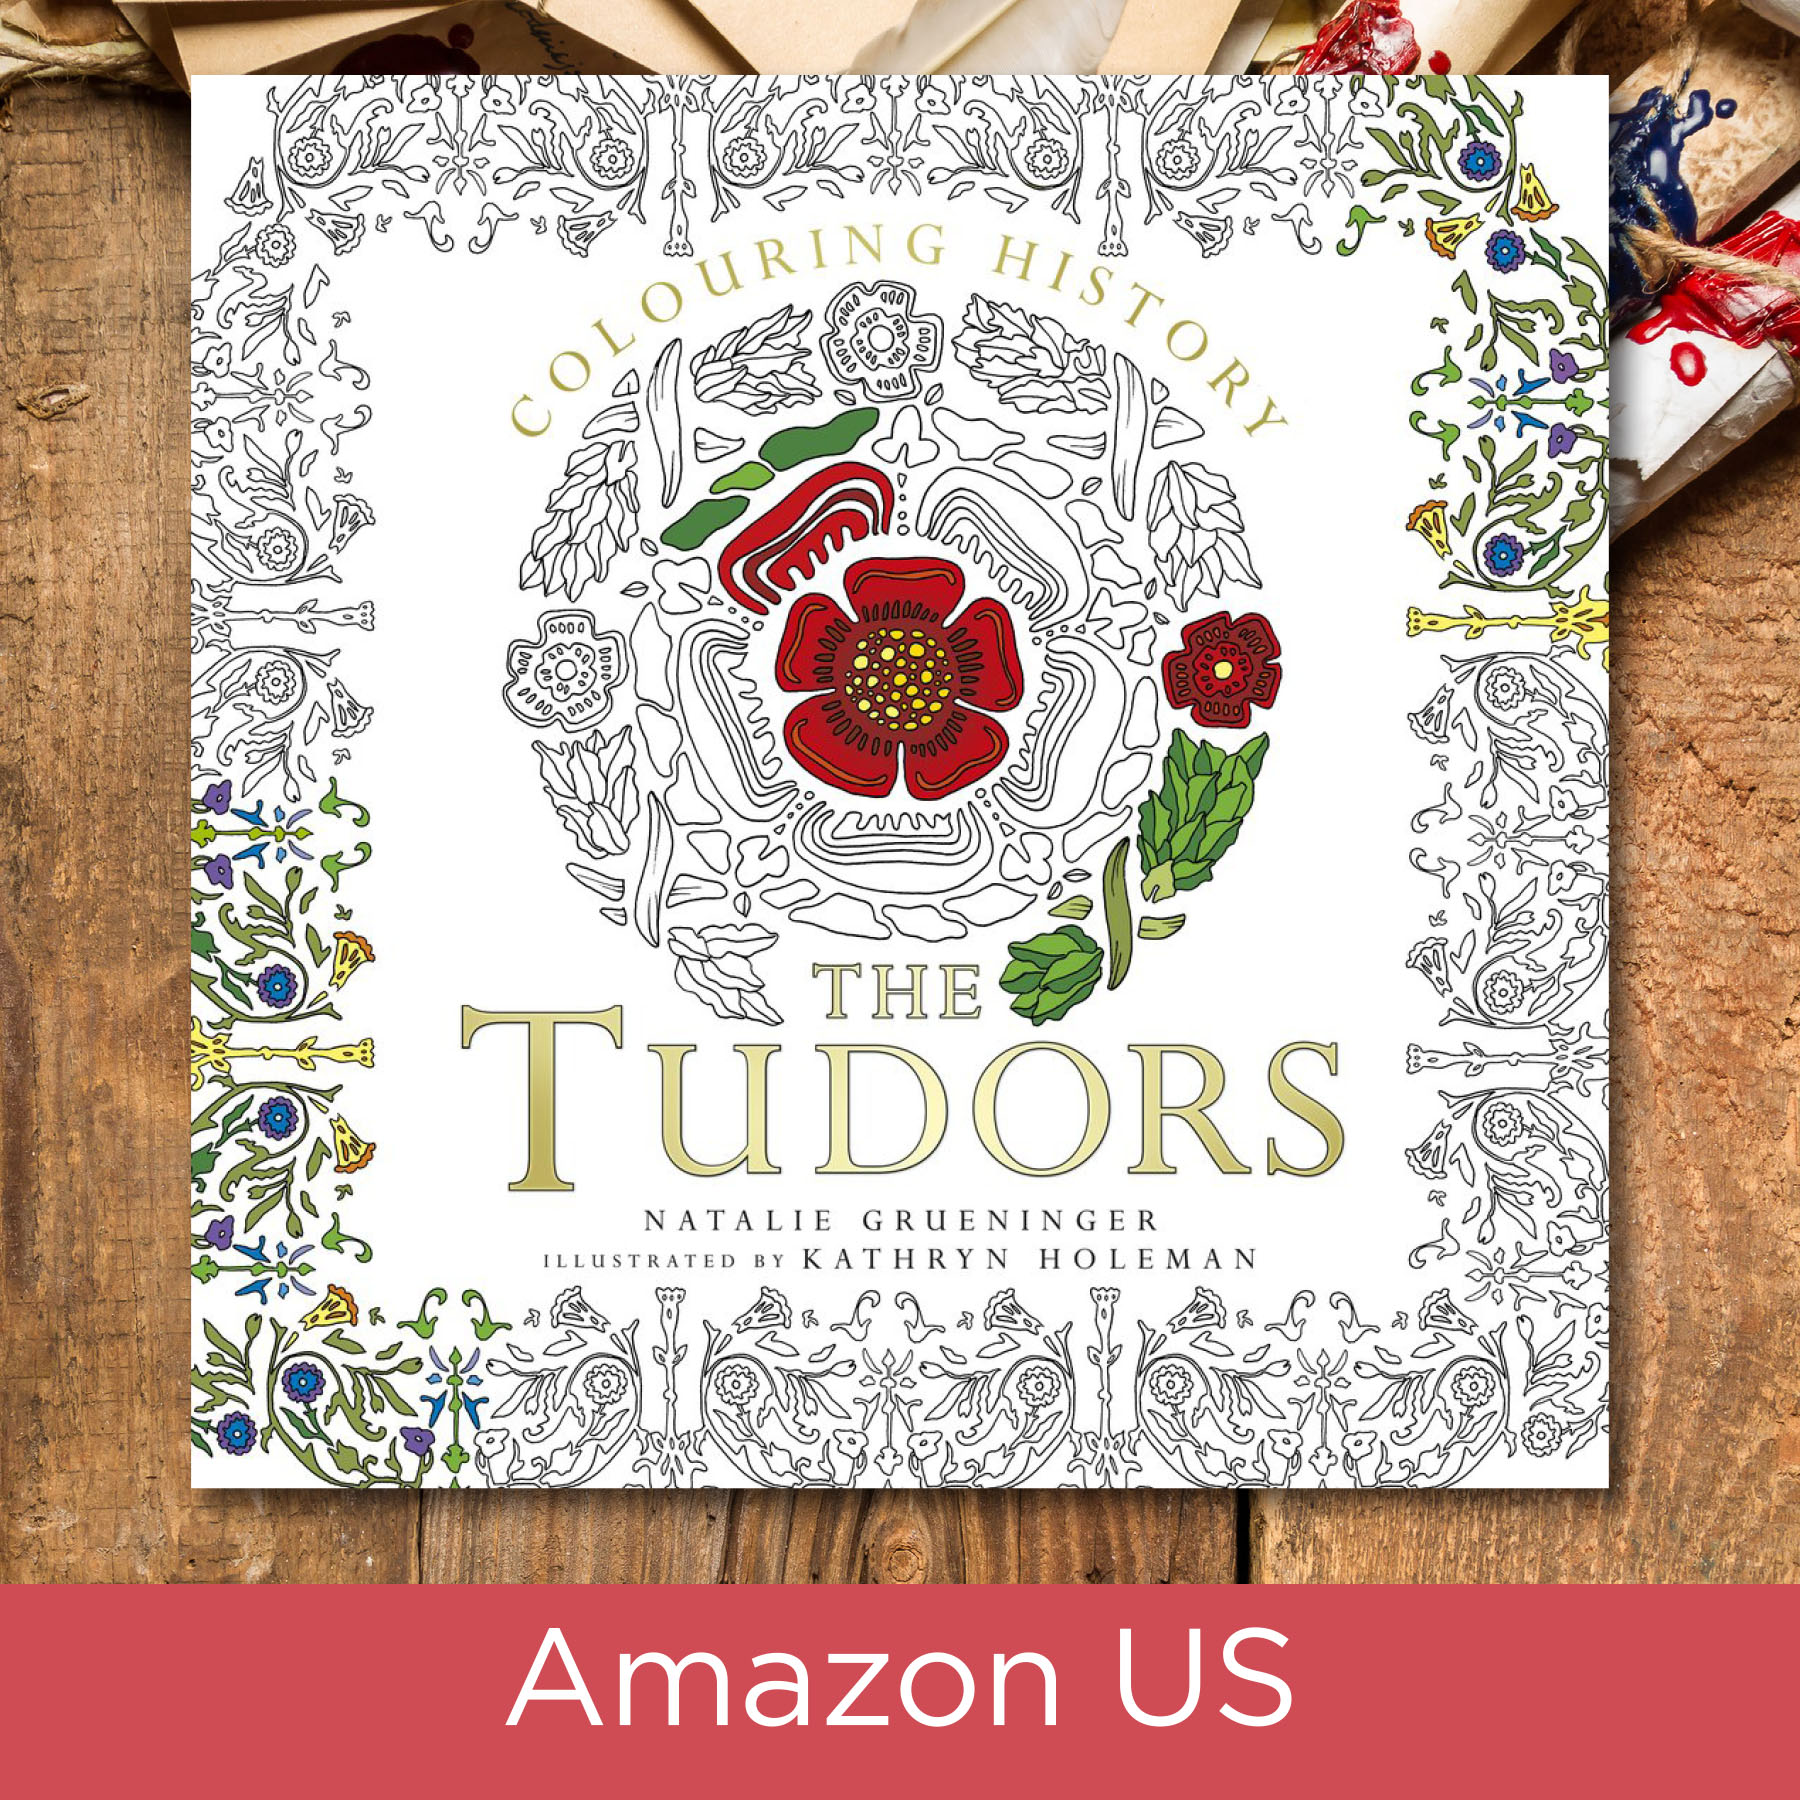 The Tudors on Amazon US